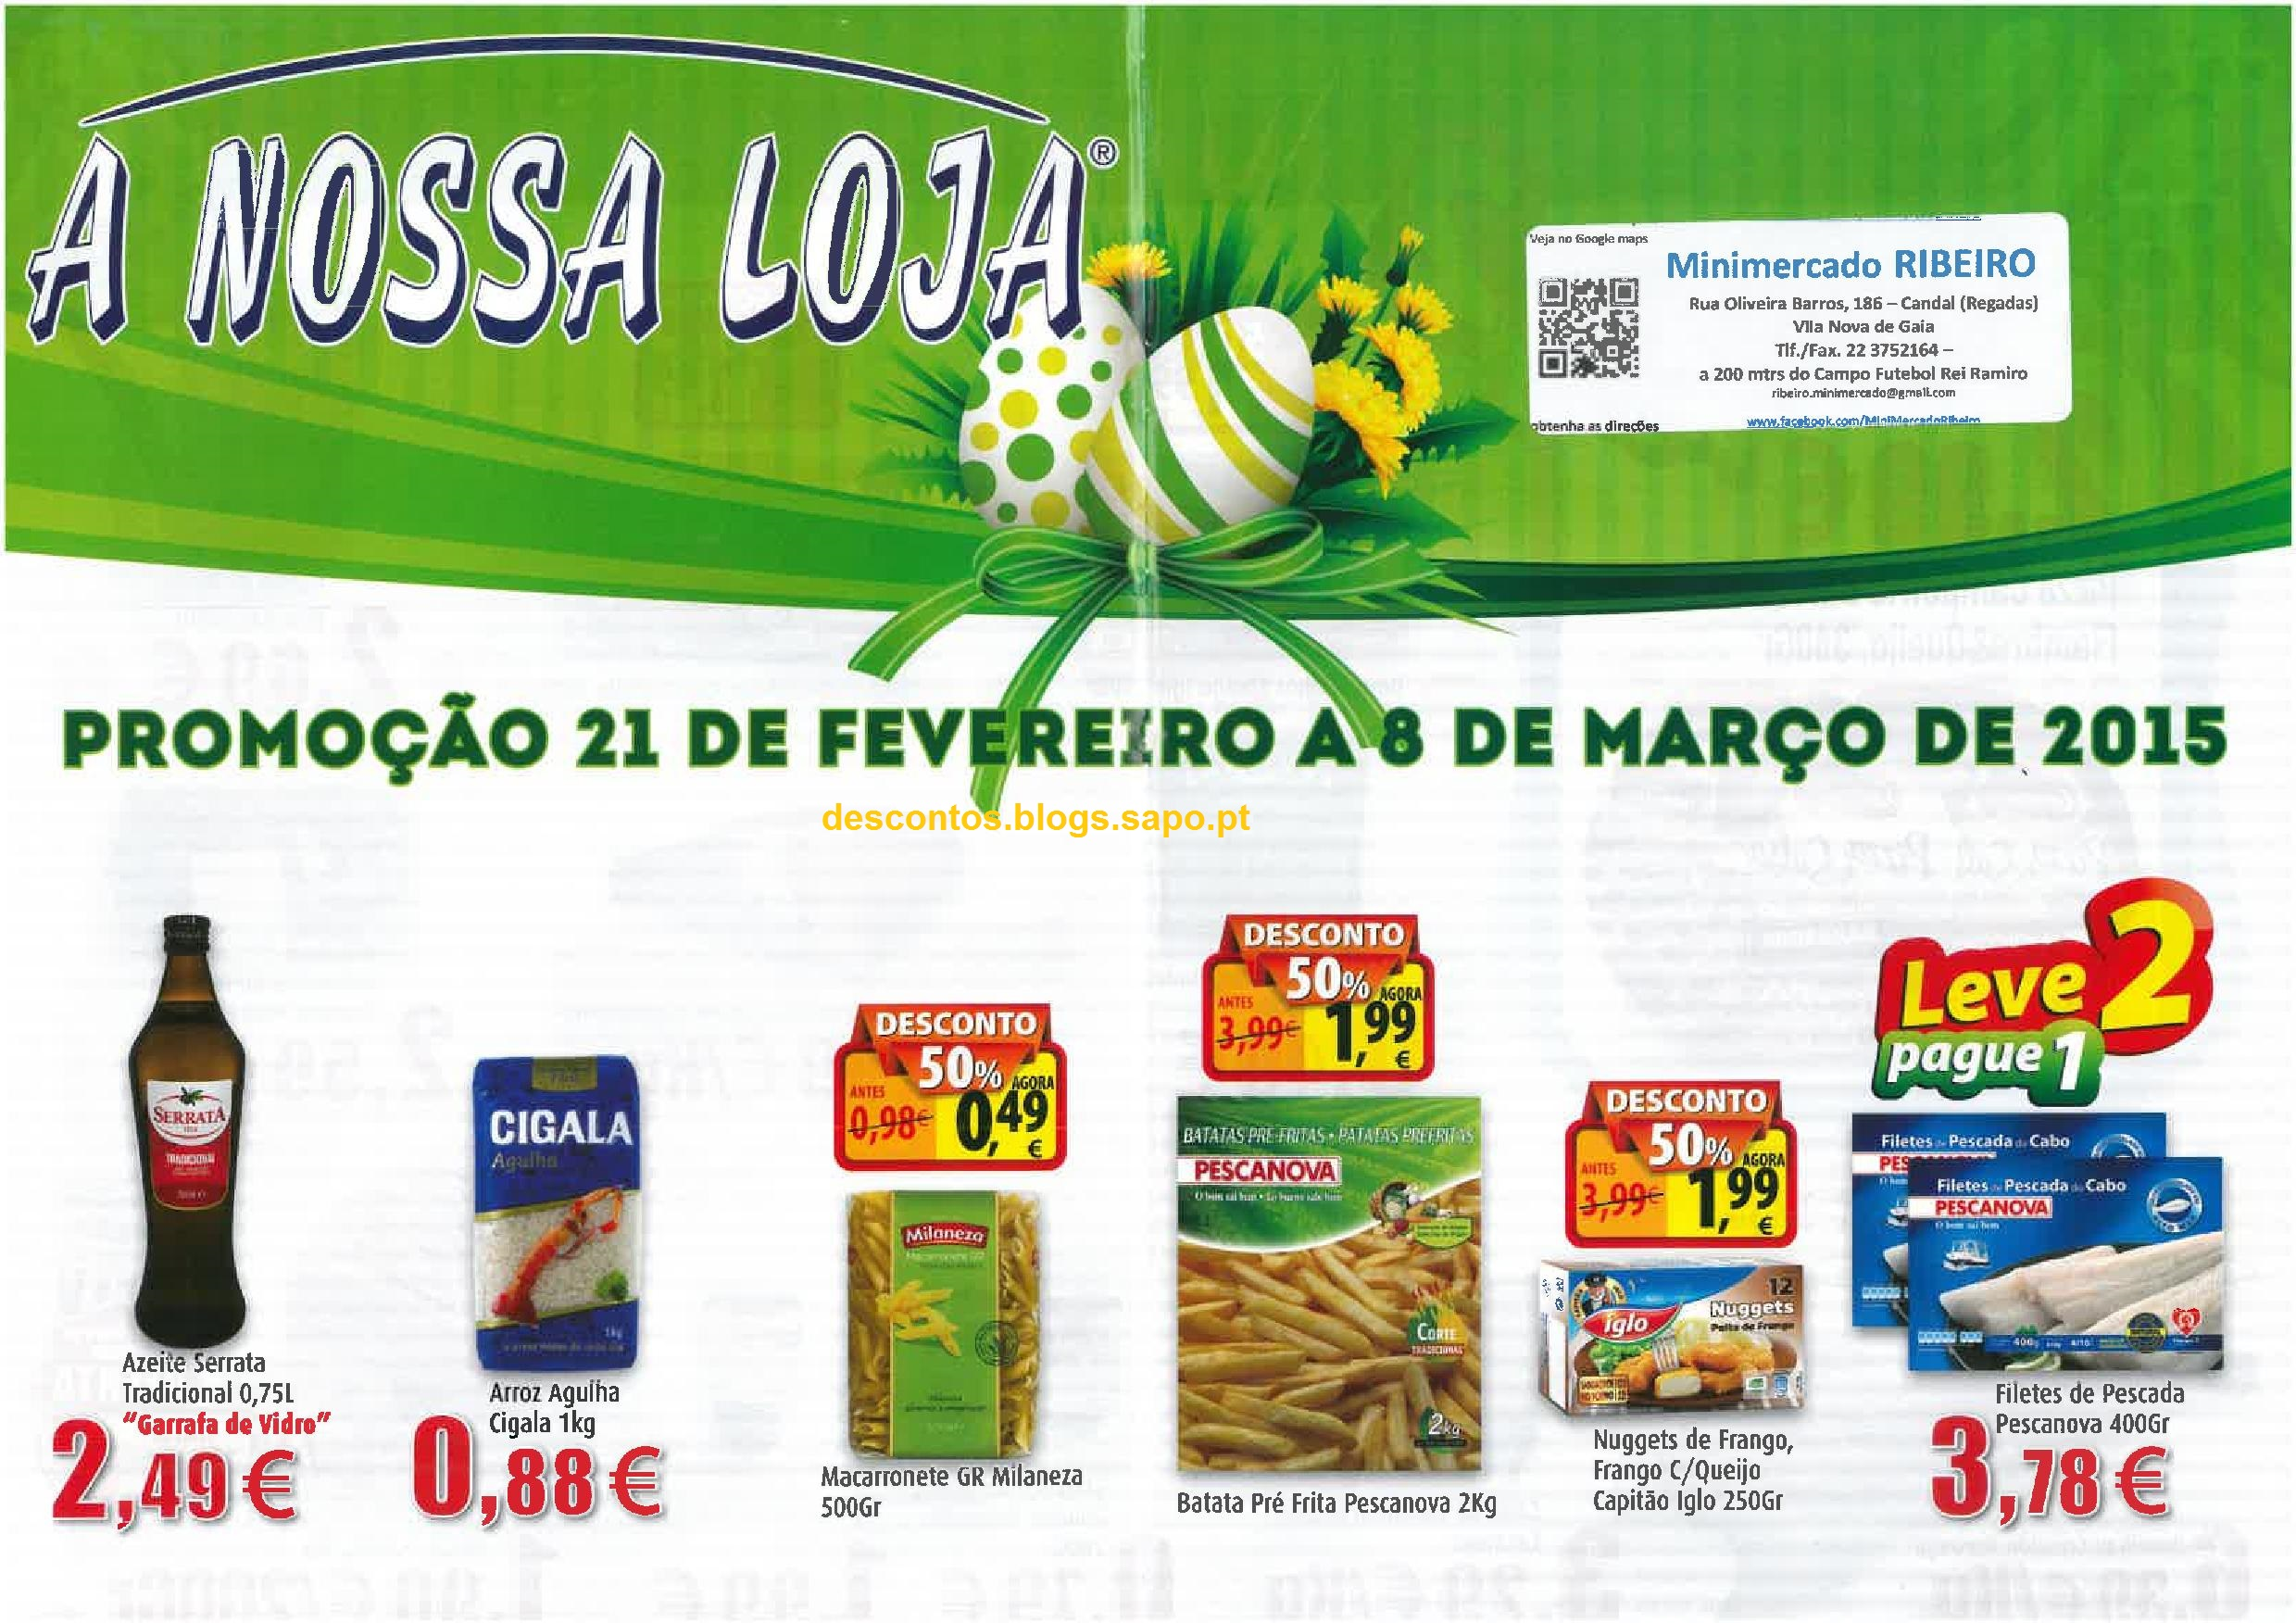 Folheto Minimercado Ribeiro 20150221-page-001.jpg